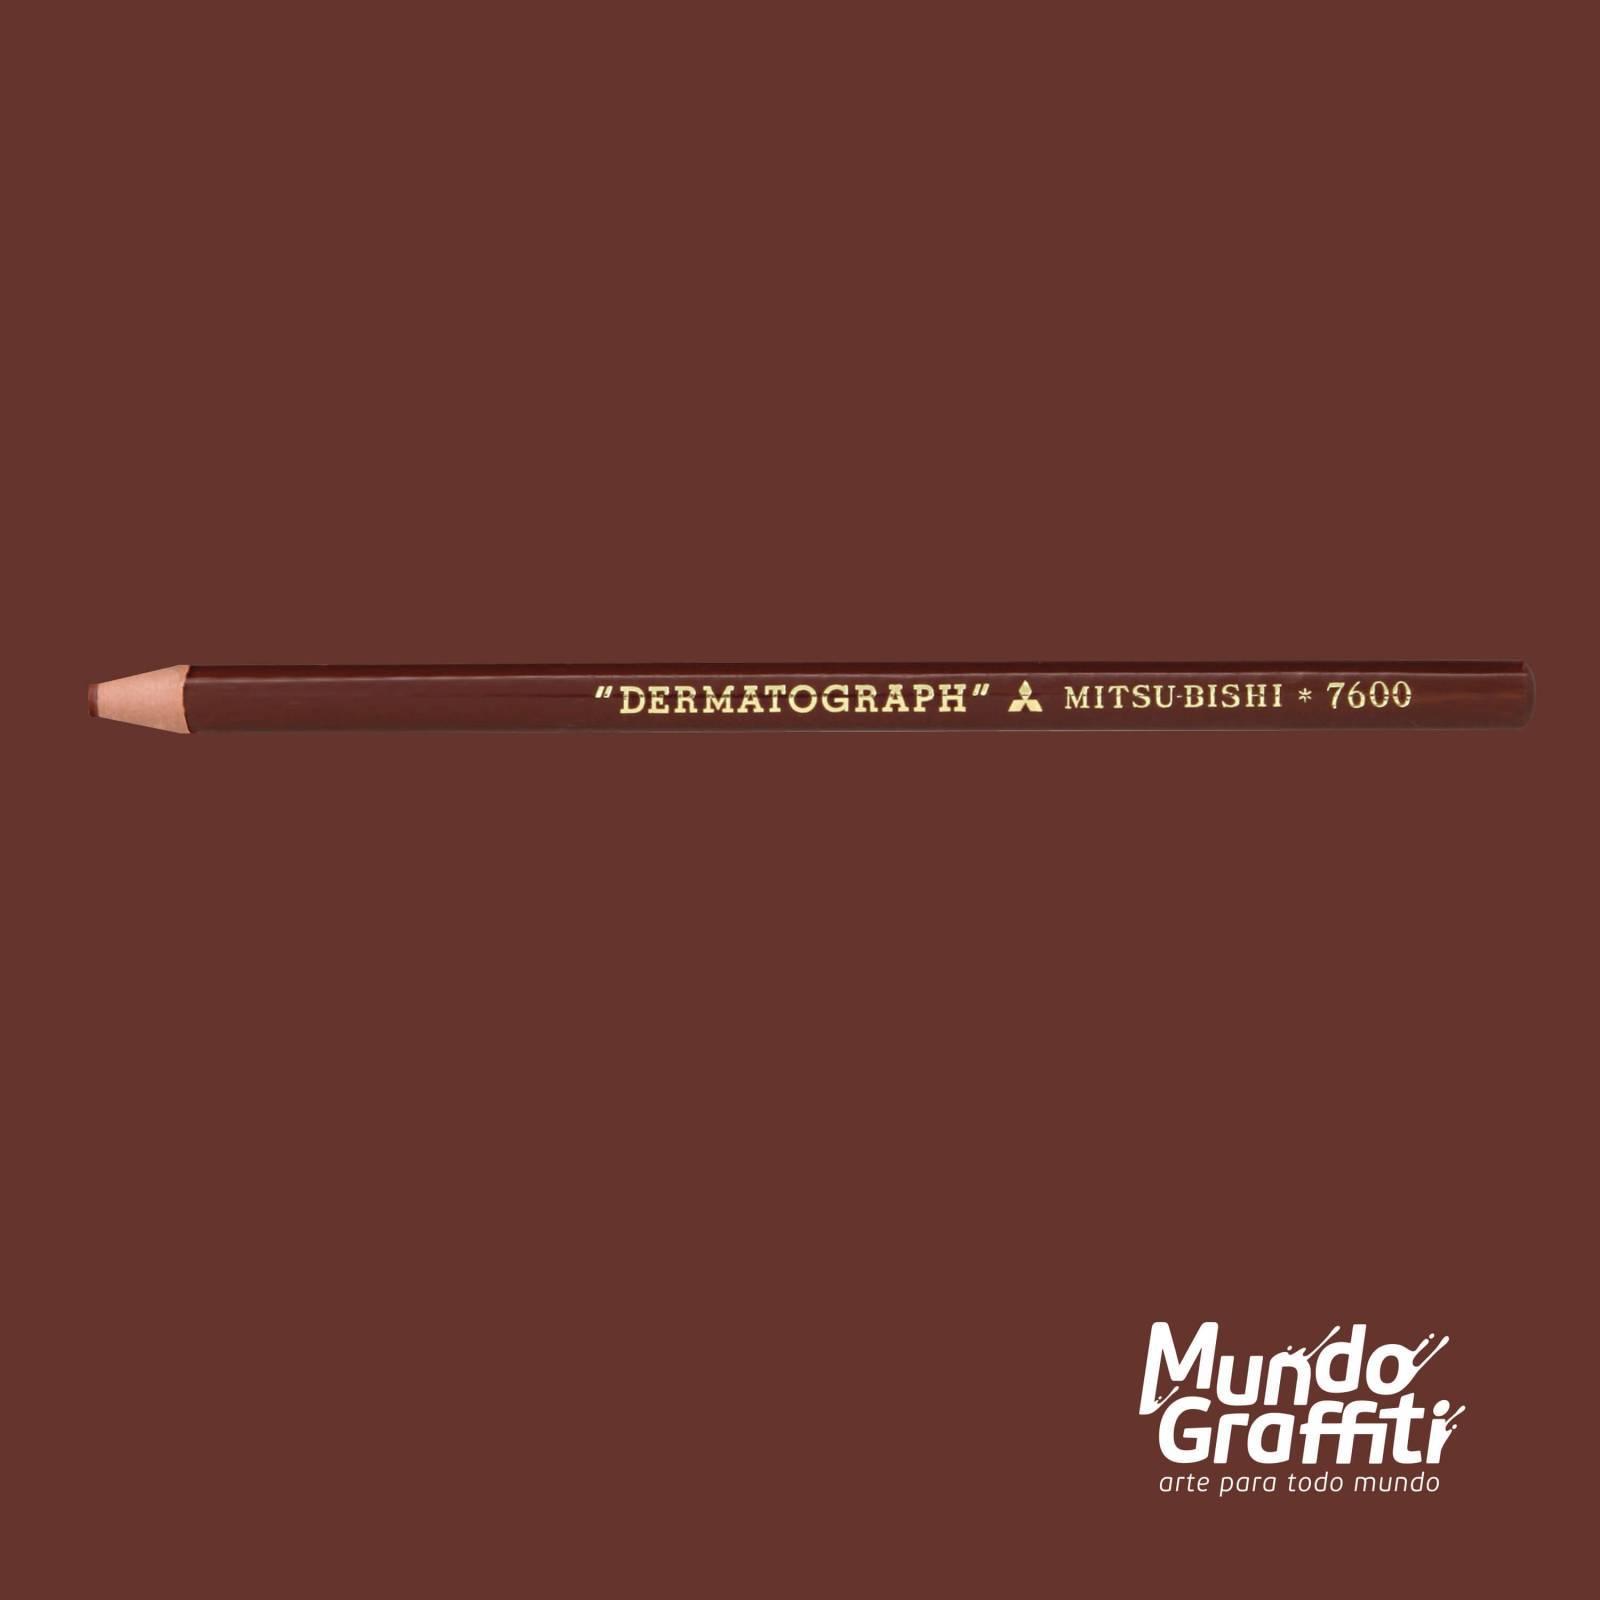 Lápis Dermatográfico Mitsubishi Marrom - Mundo Graffiti